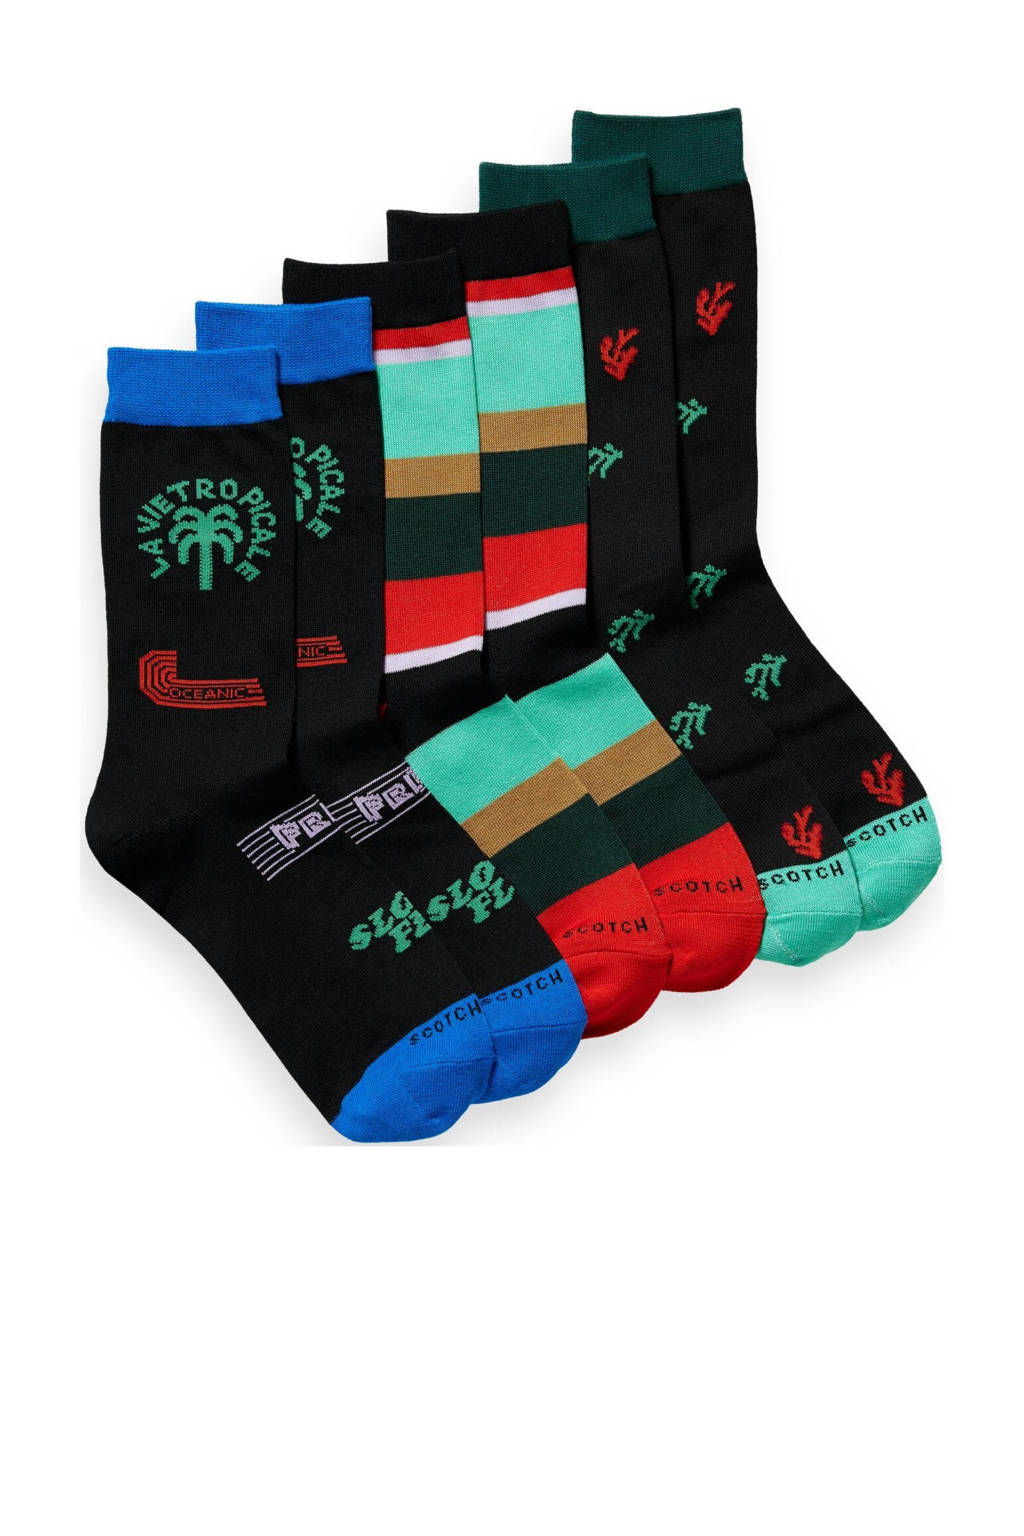 Scotch & Soda sokken - set van 3 zwart/multi, Zwart/multi